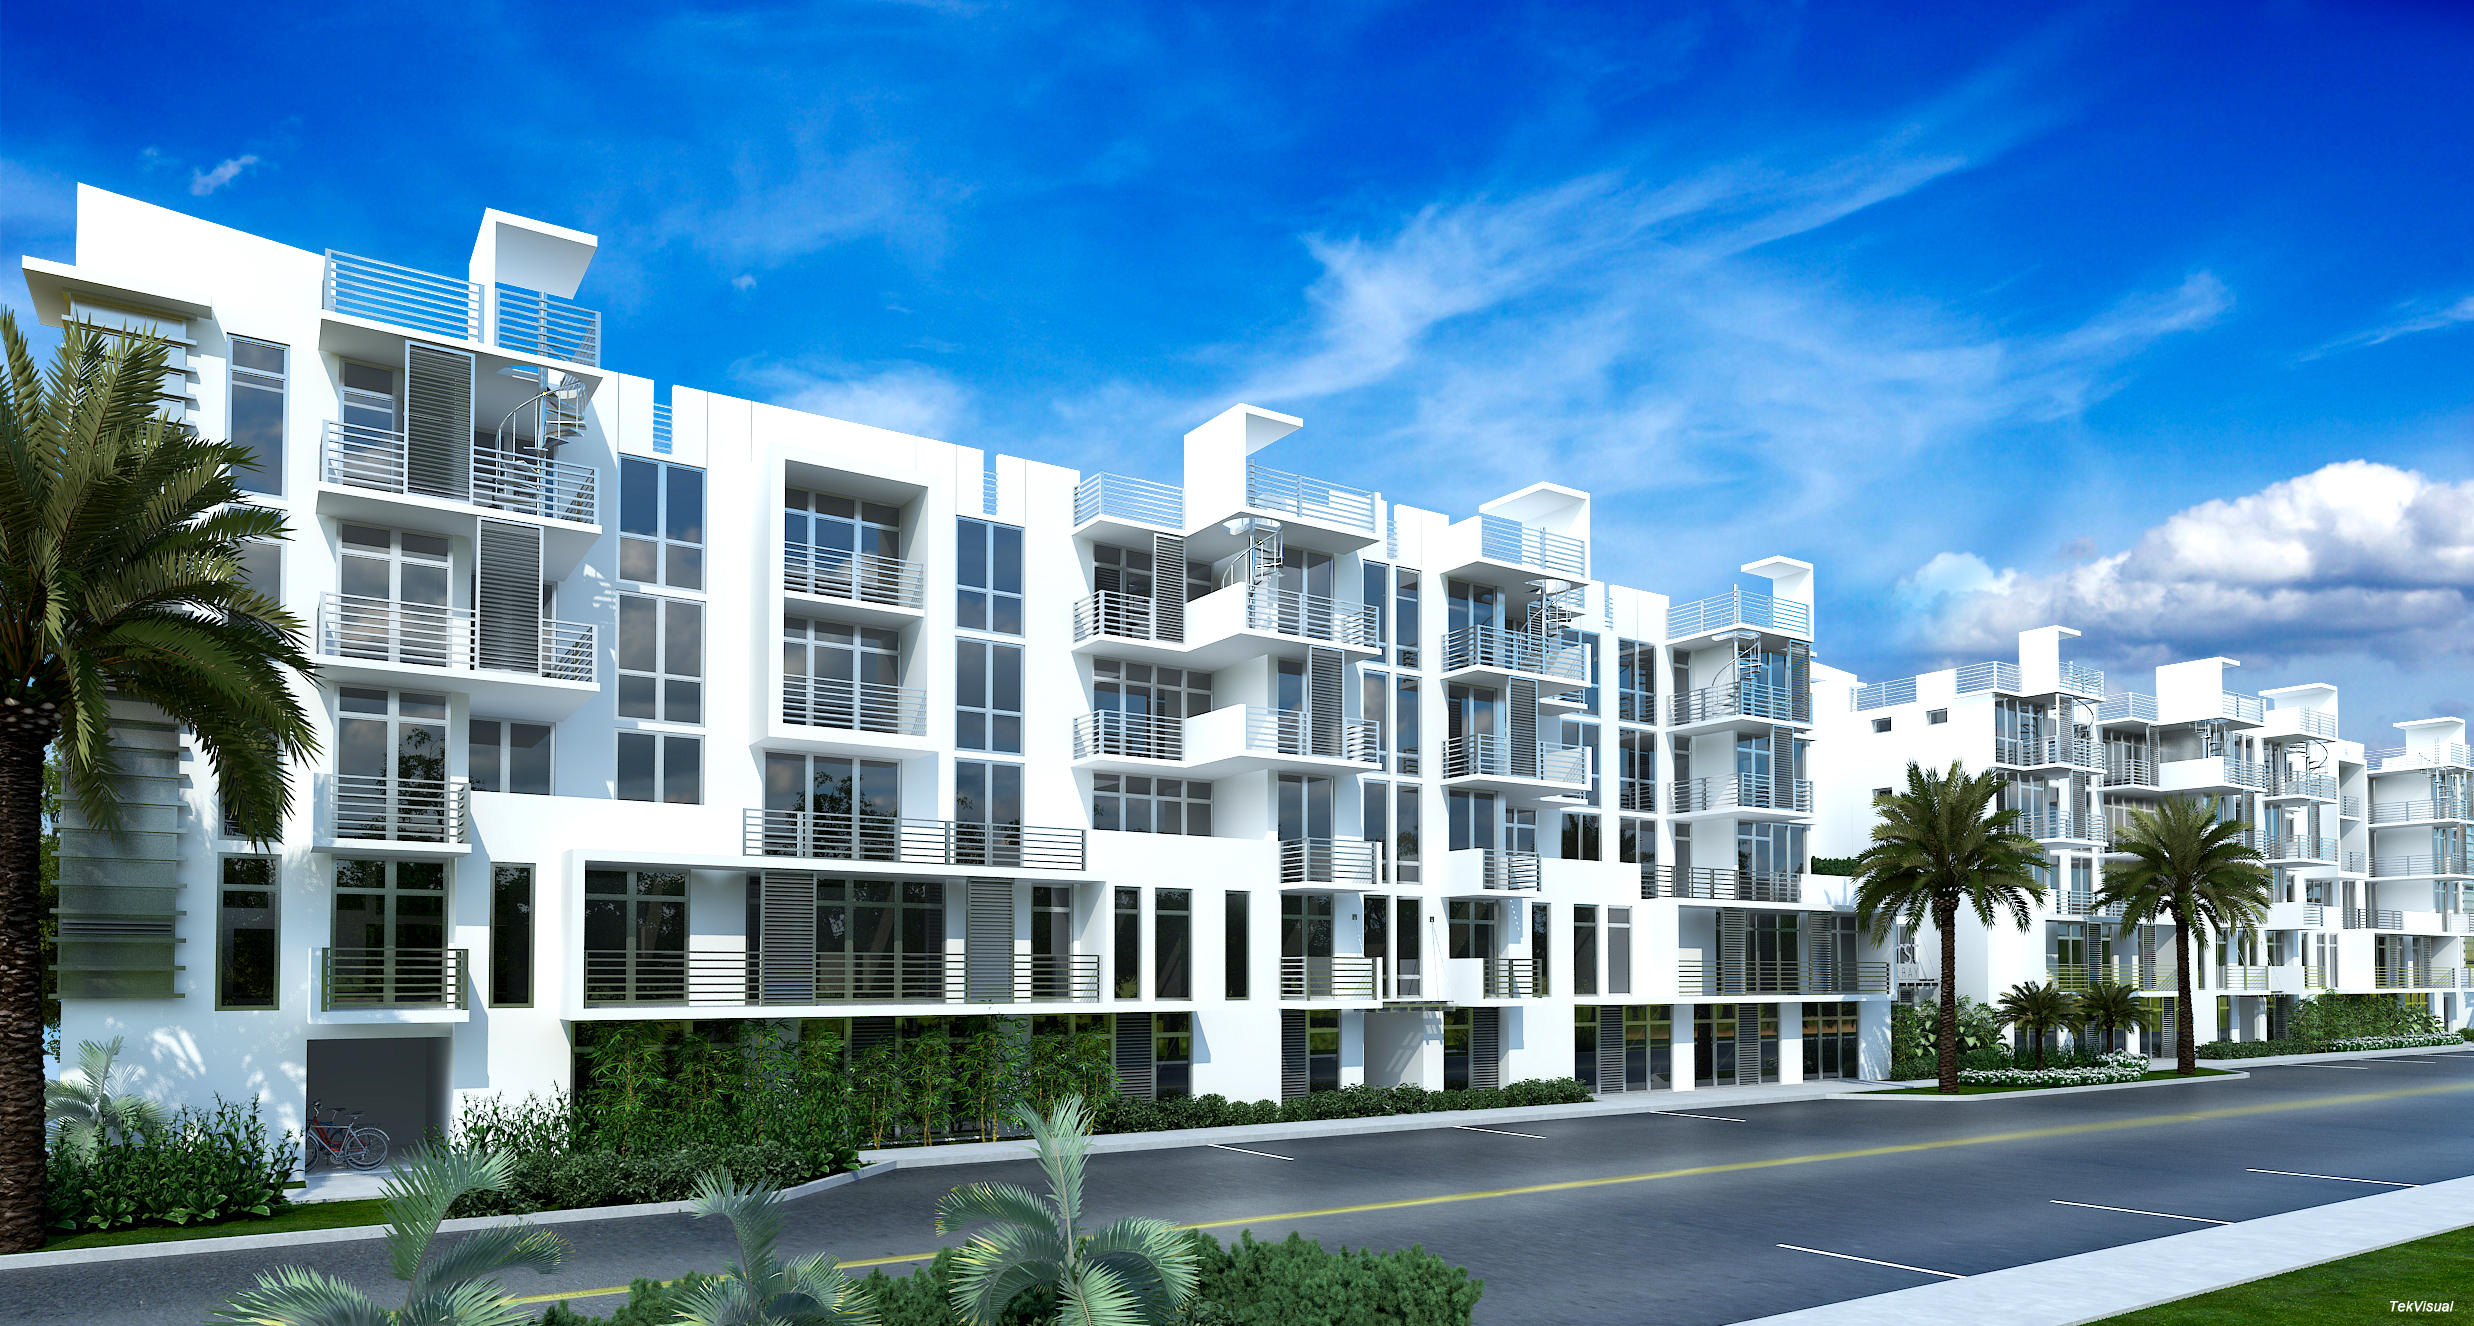 Details for 111 1st Avenue Se 502, Delray Beach, FL 33444